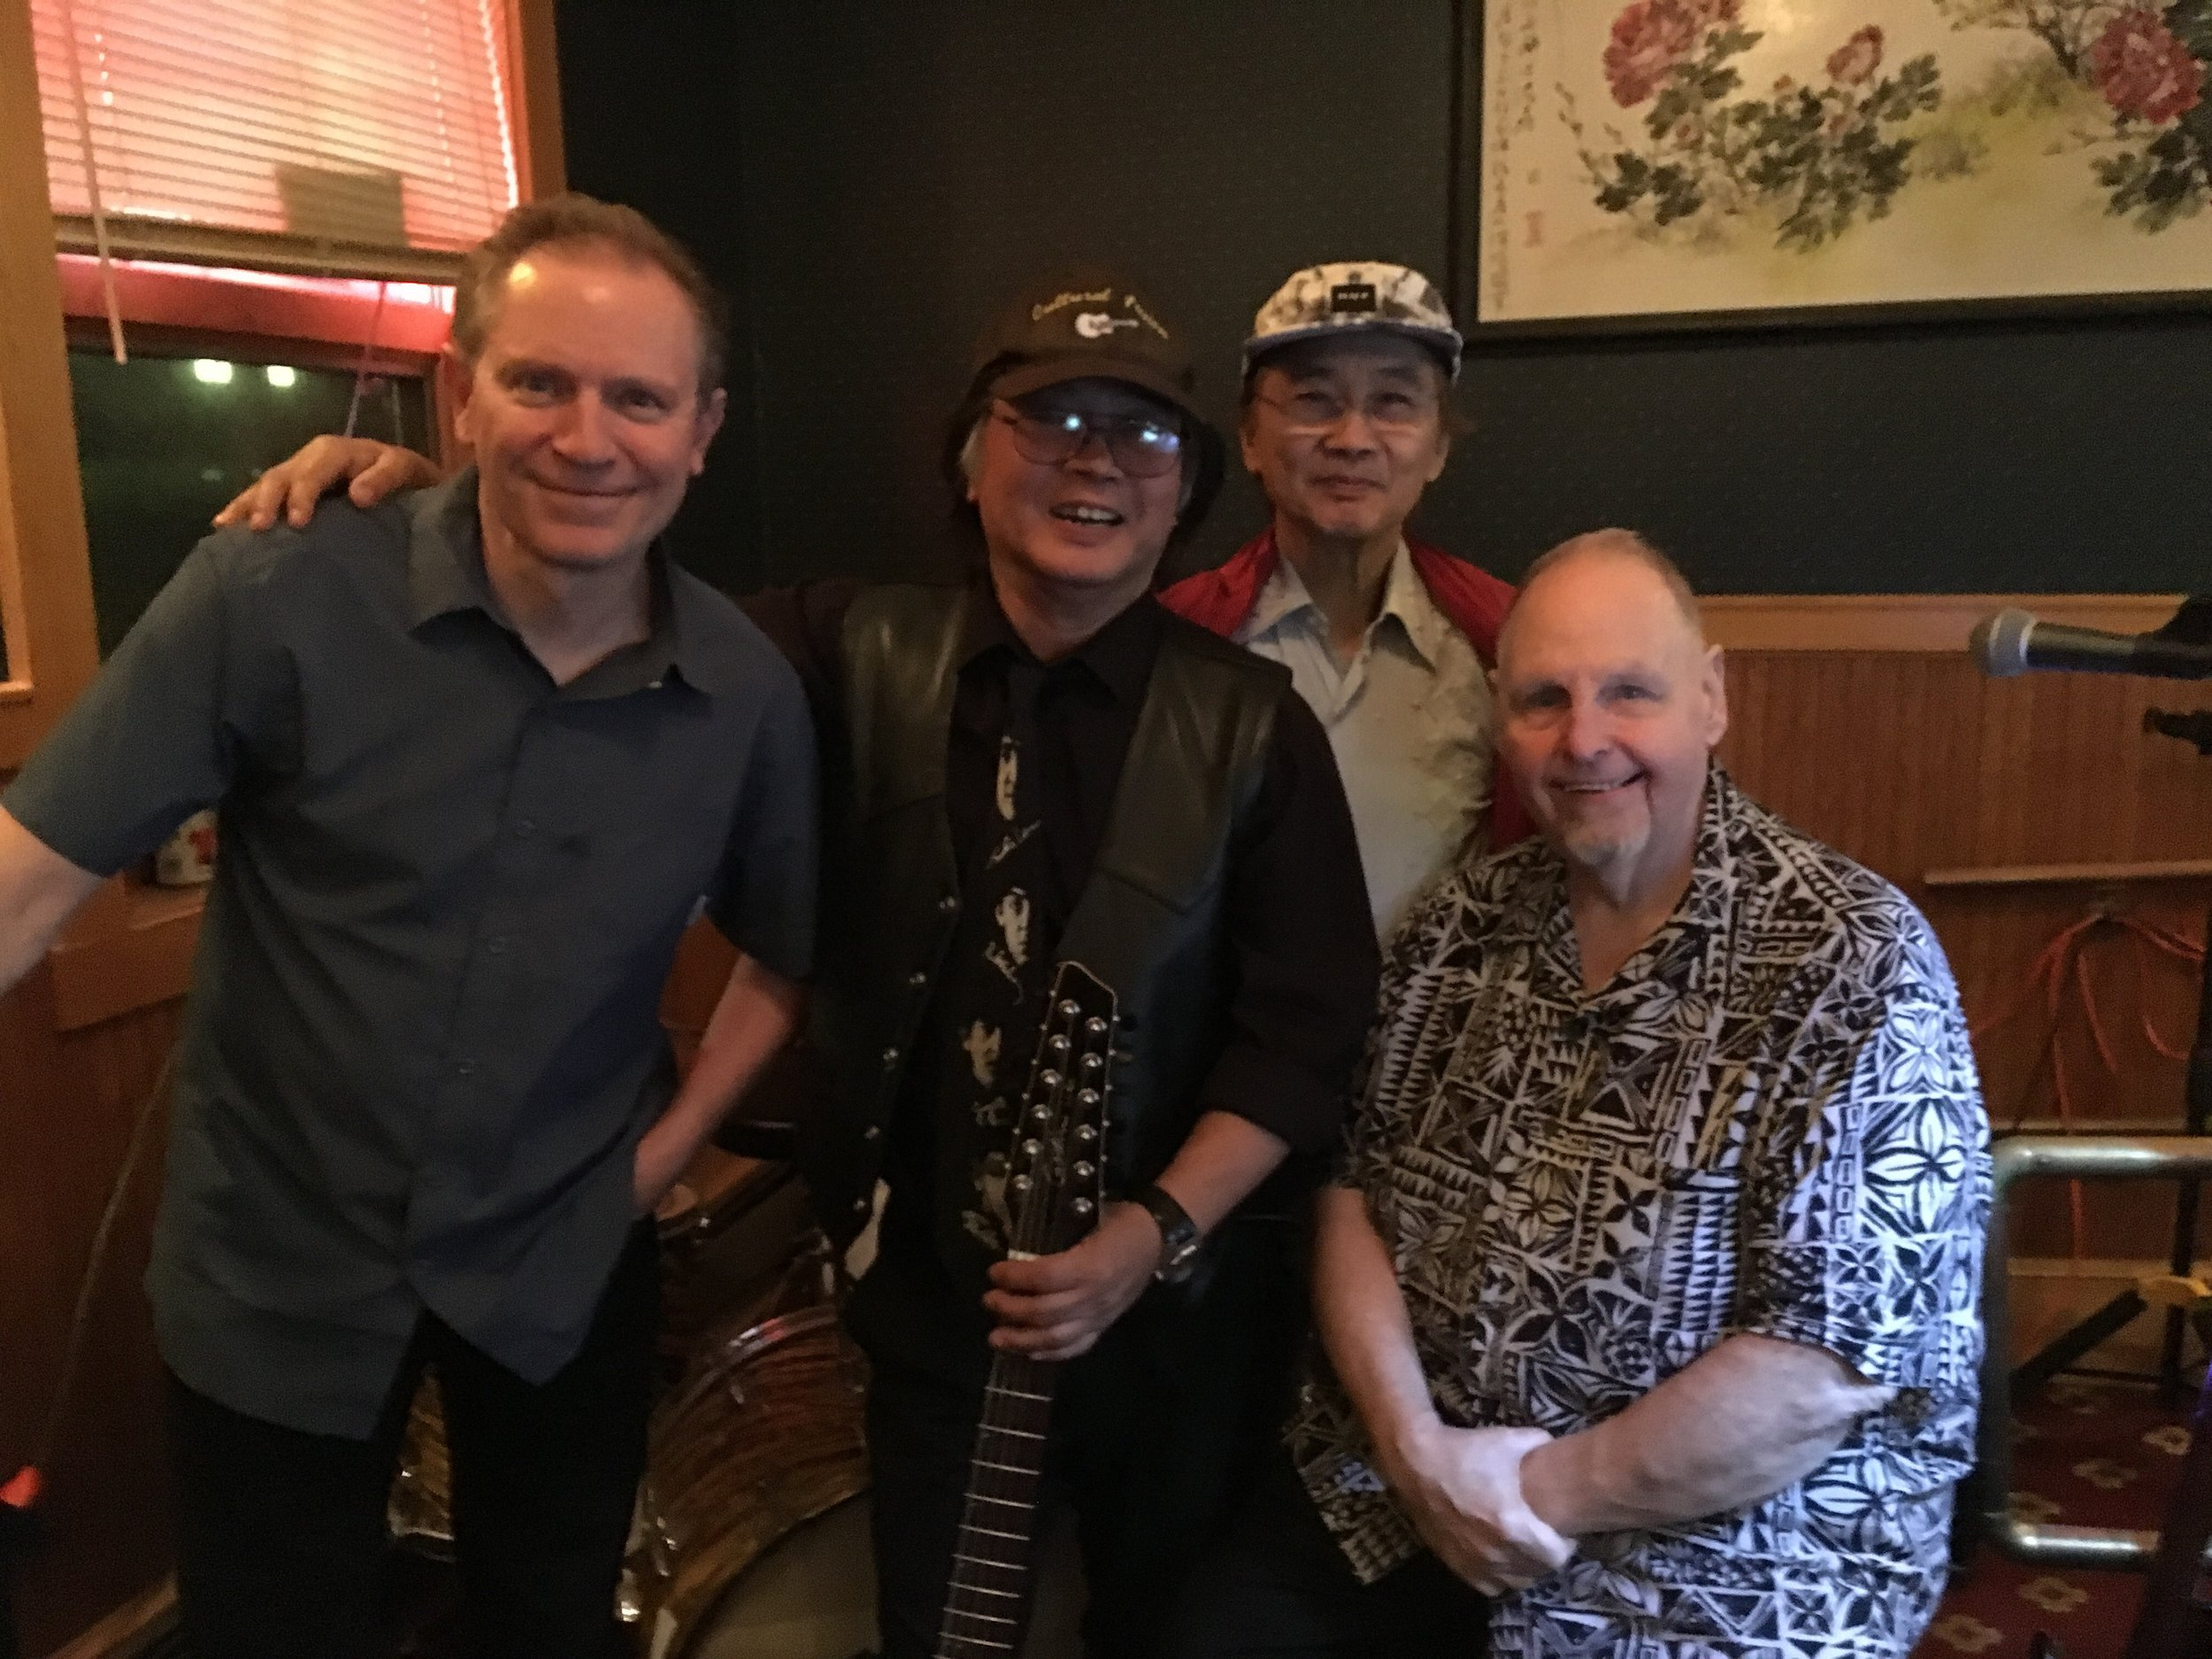 Alex Wan Group live at Yangtze in West Bridgewater MA